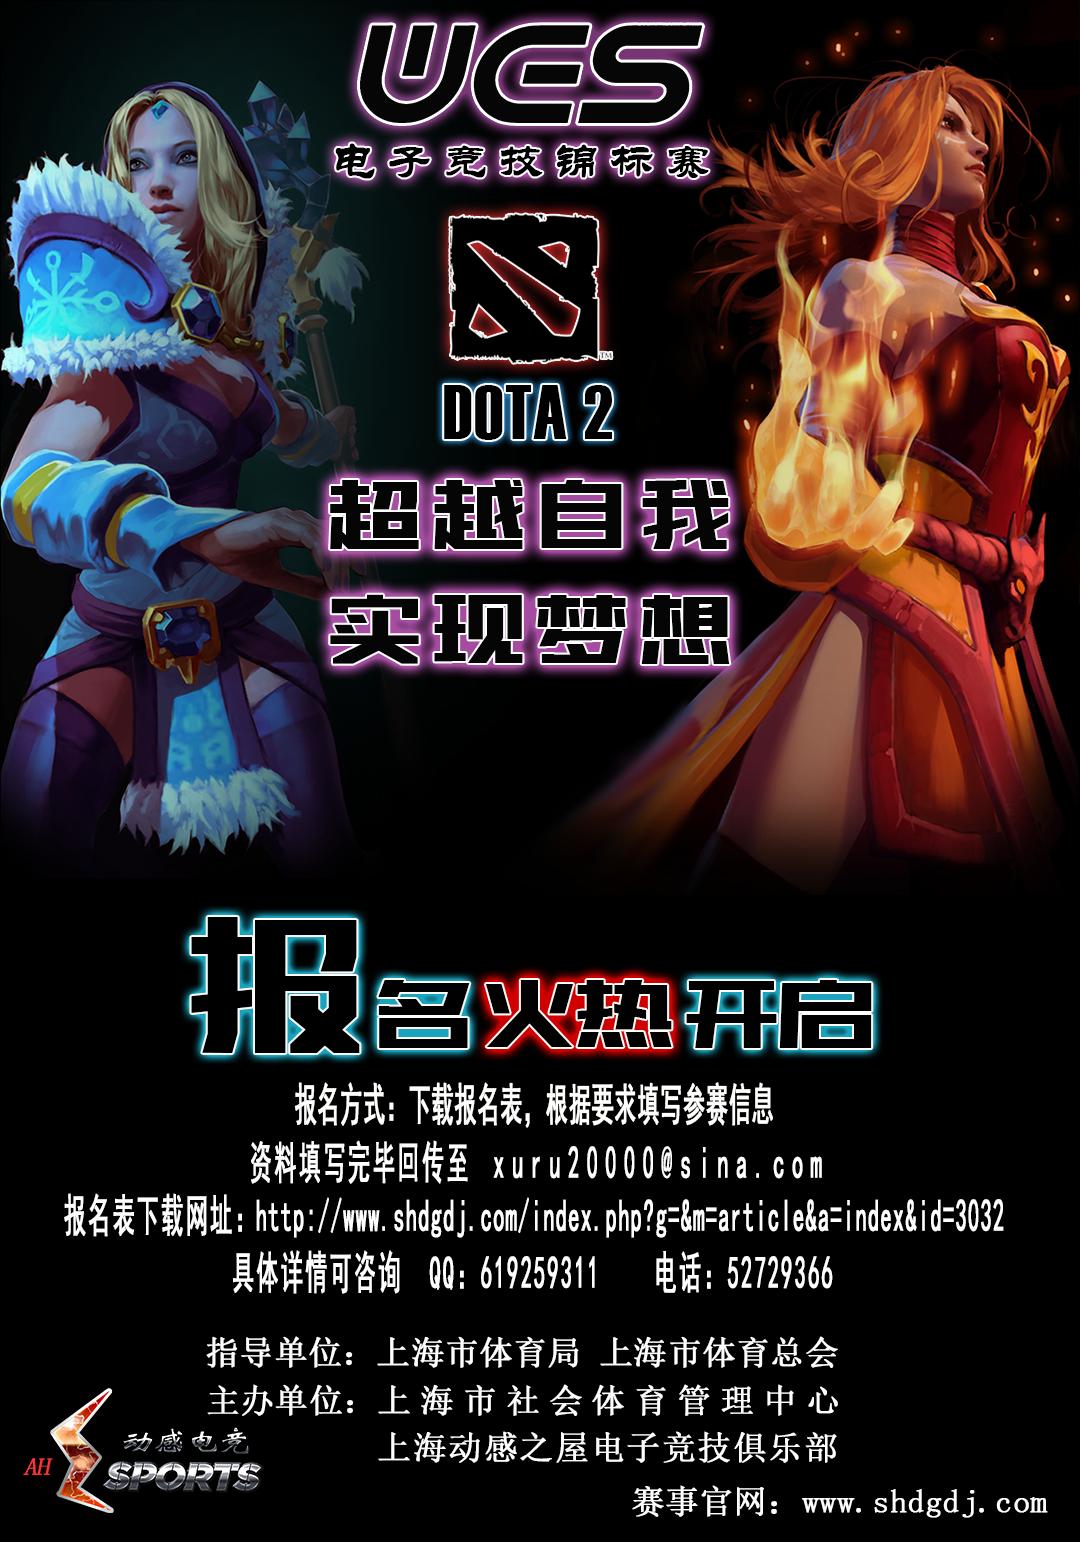 dota2宣传海报_02_0.png